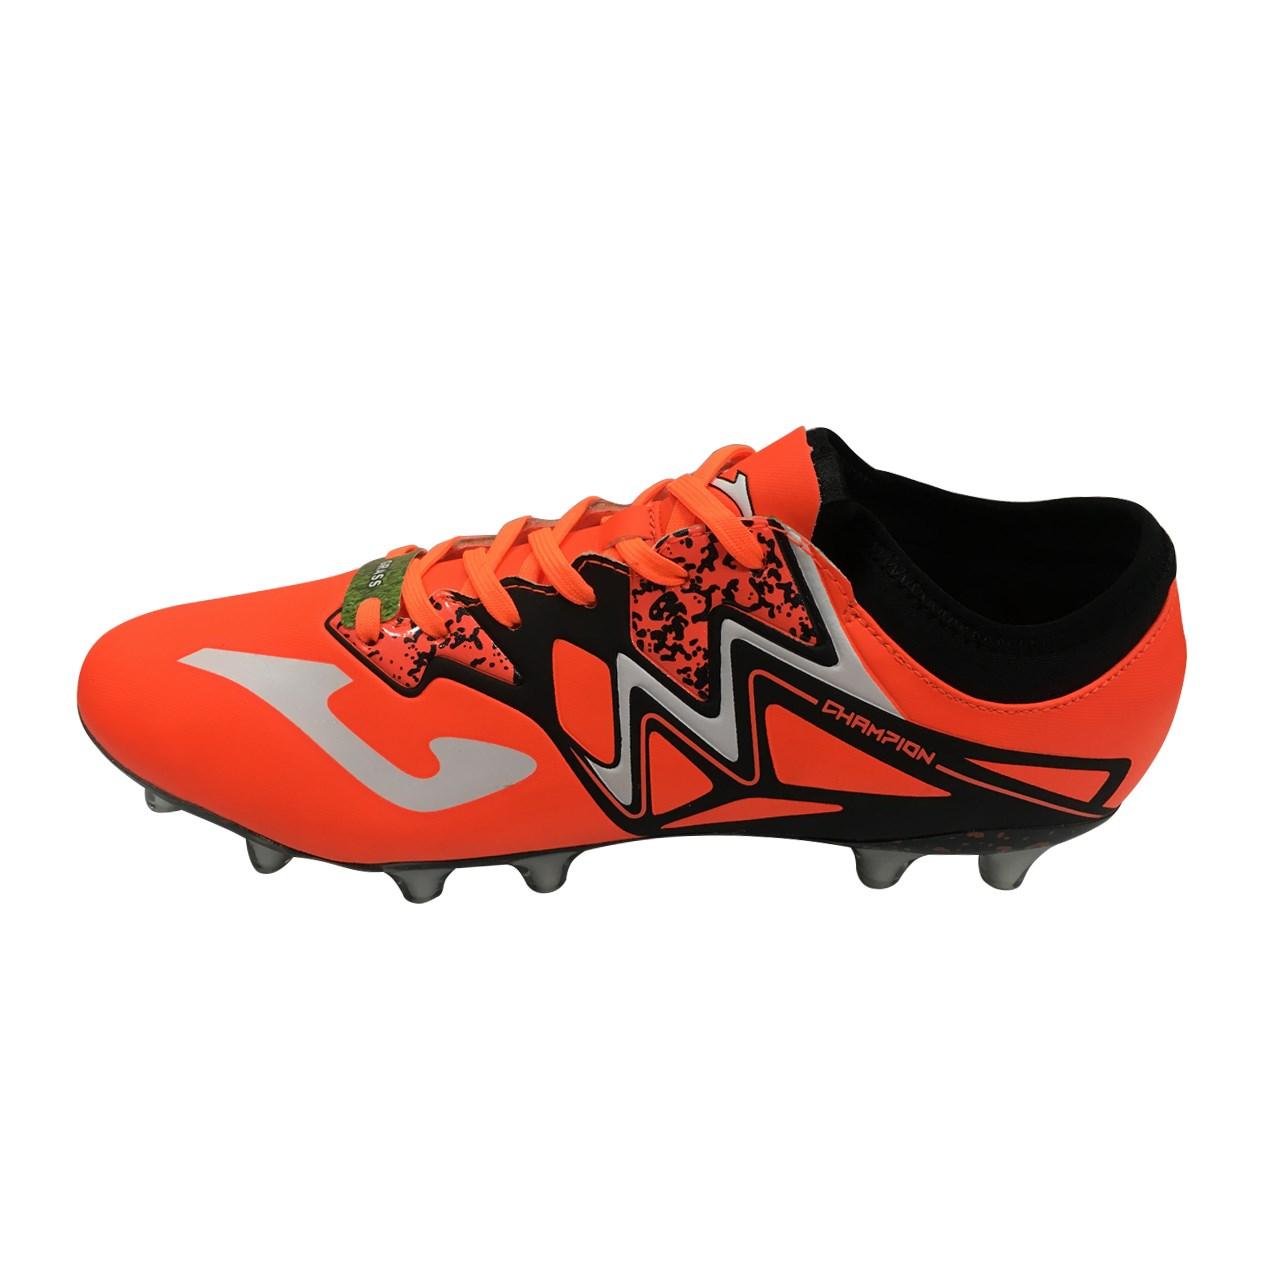 کفش مخصوص فوتبال جوما مدل CHAMPION CUP 708